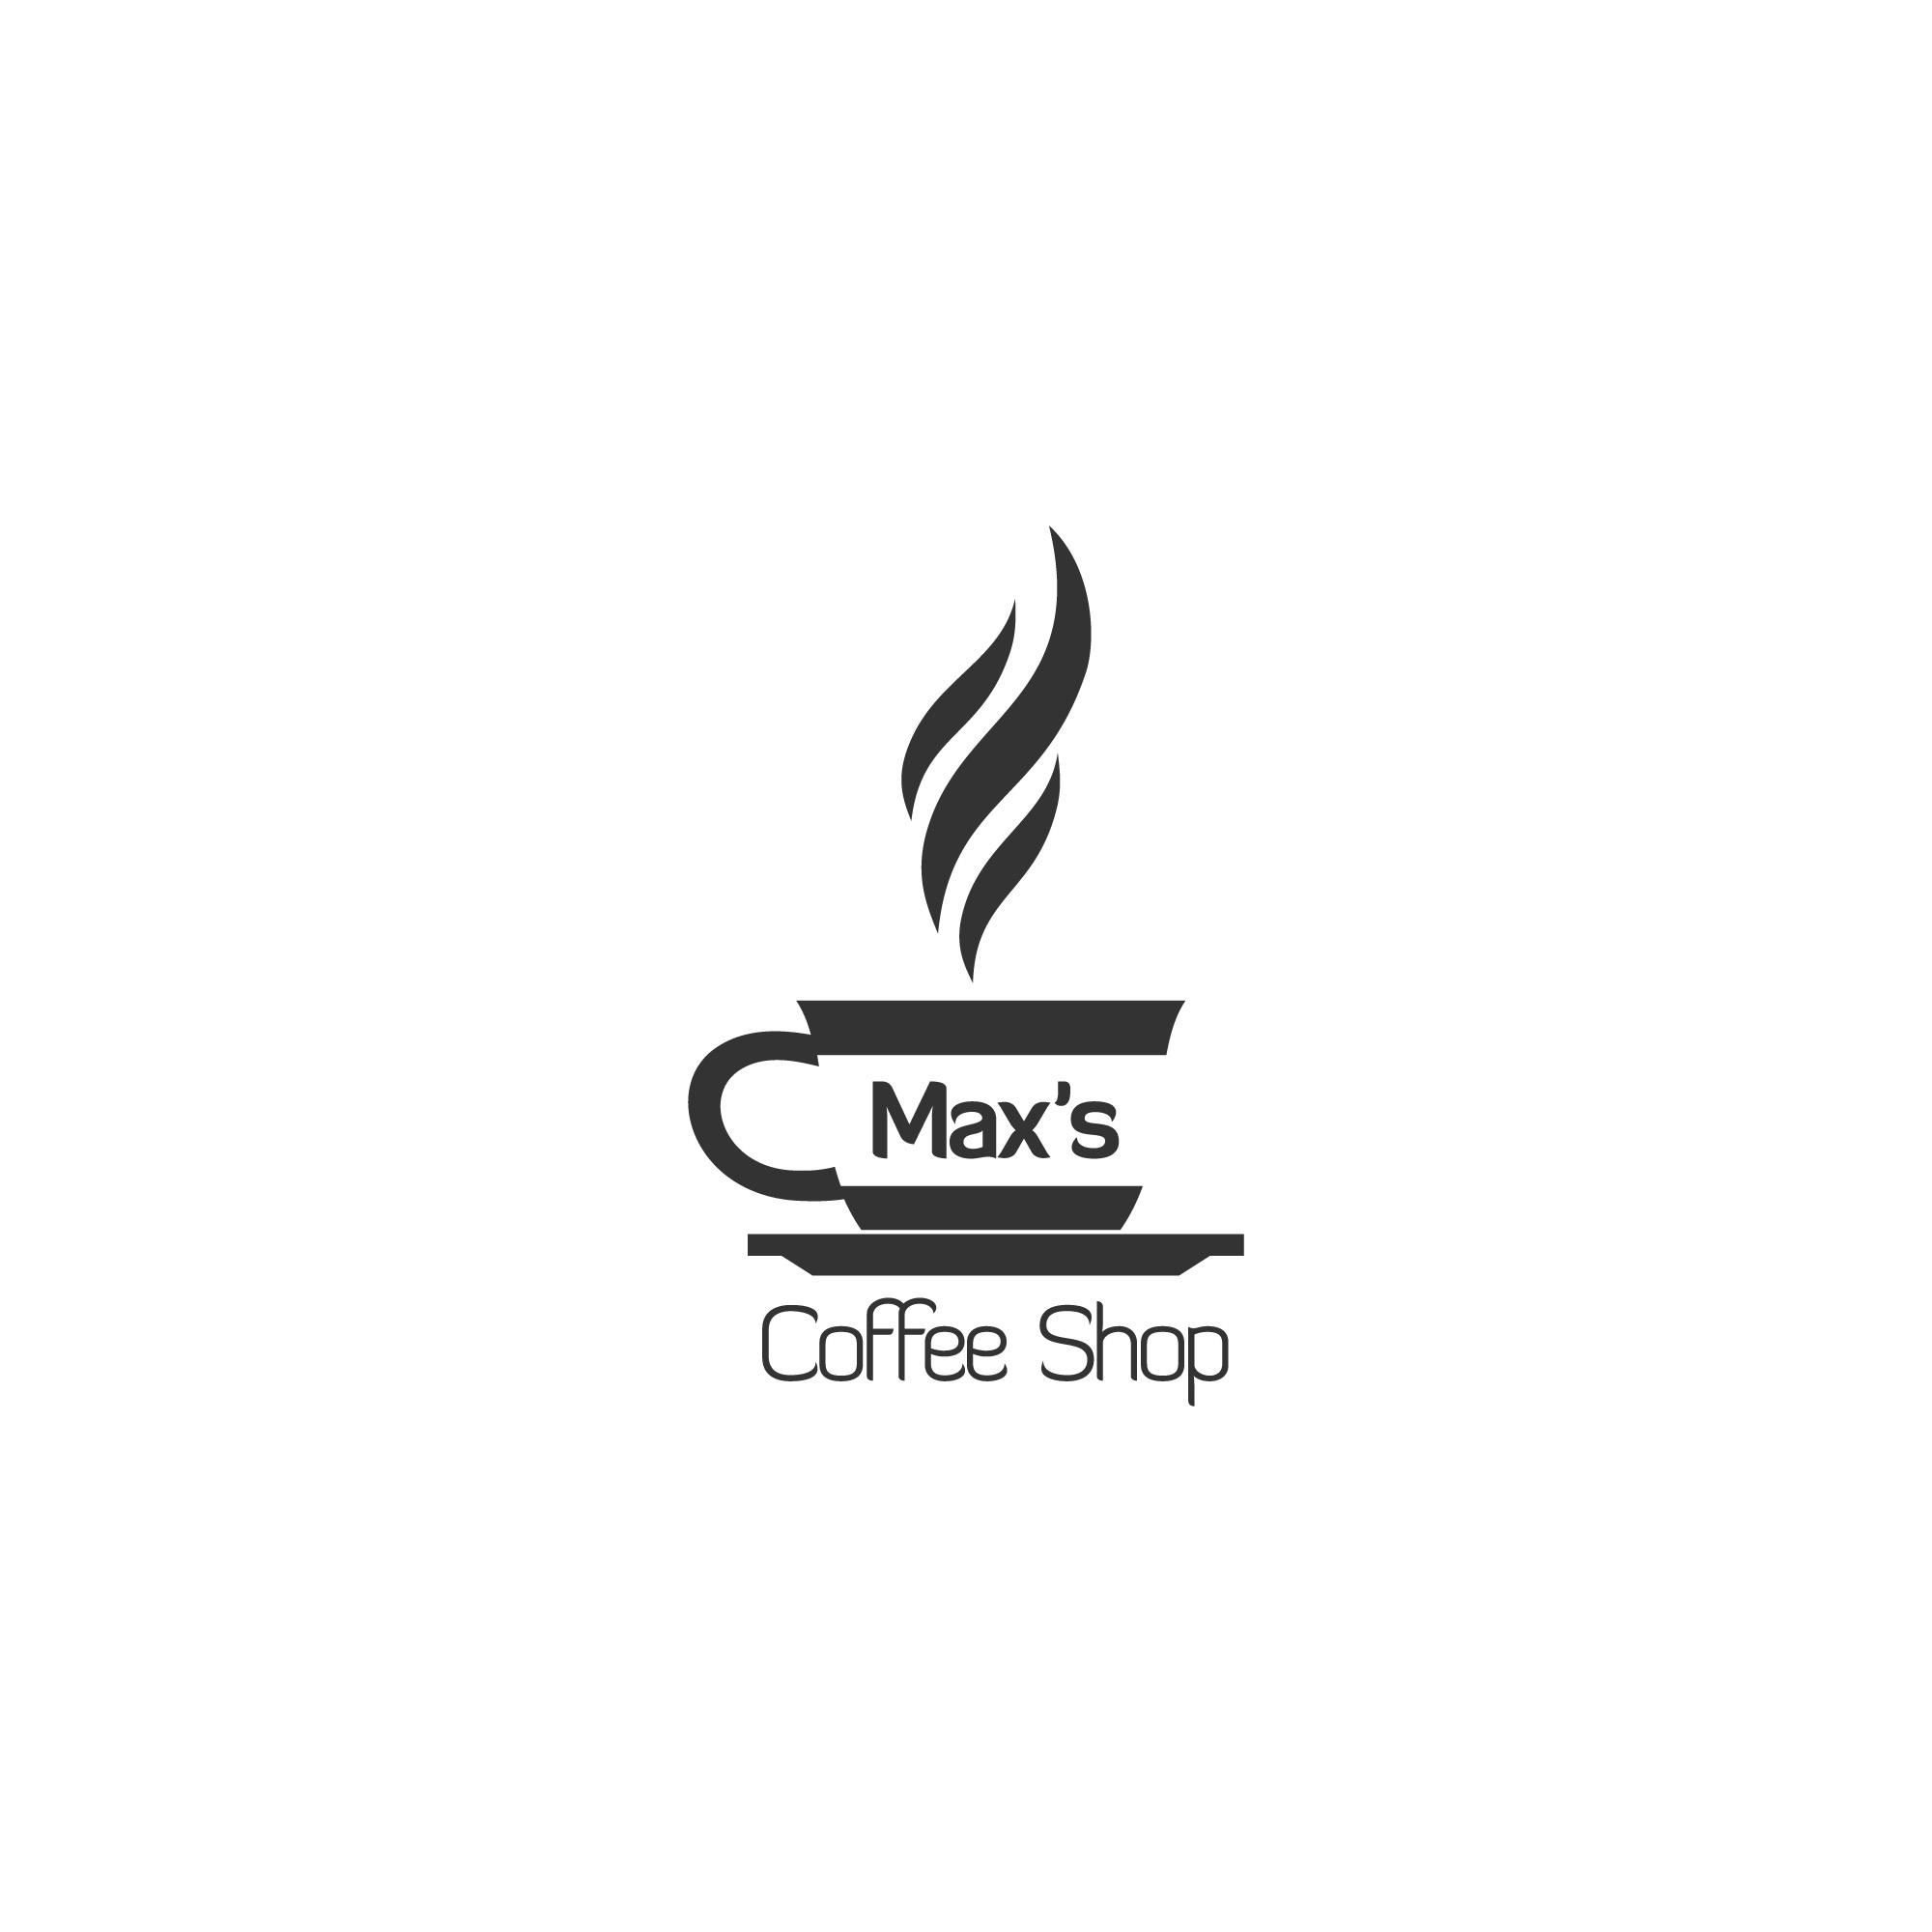 MAXS COFFEE SHOP LIMITED